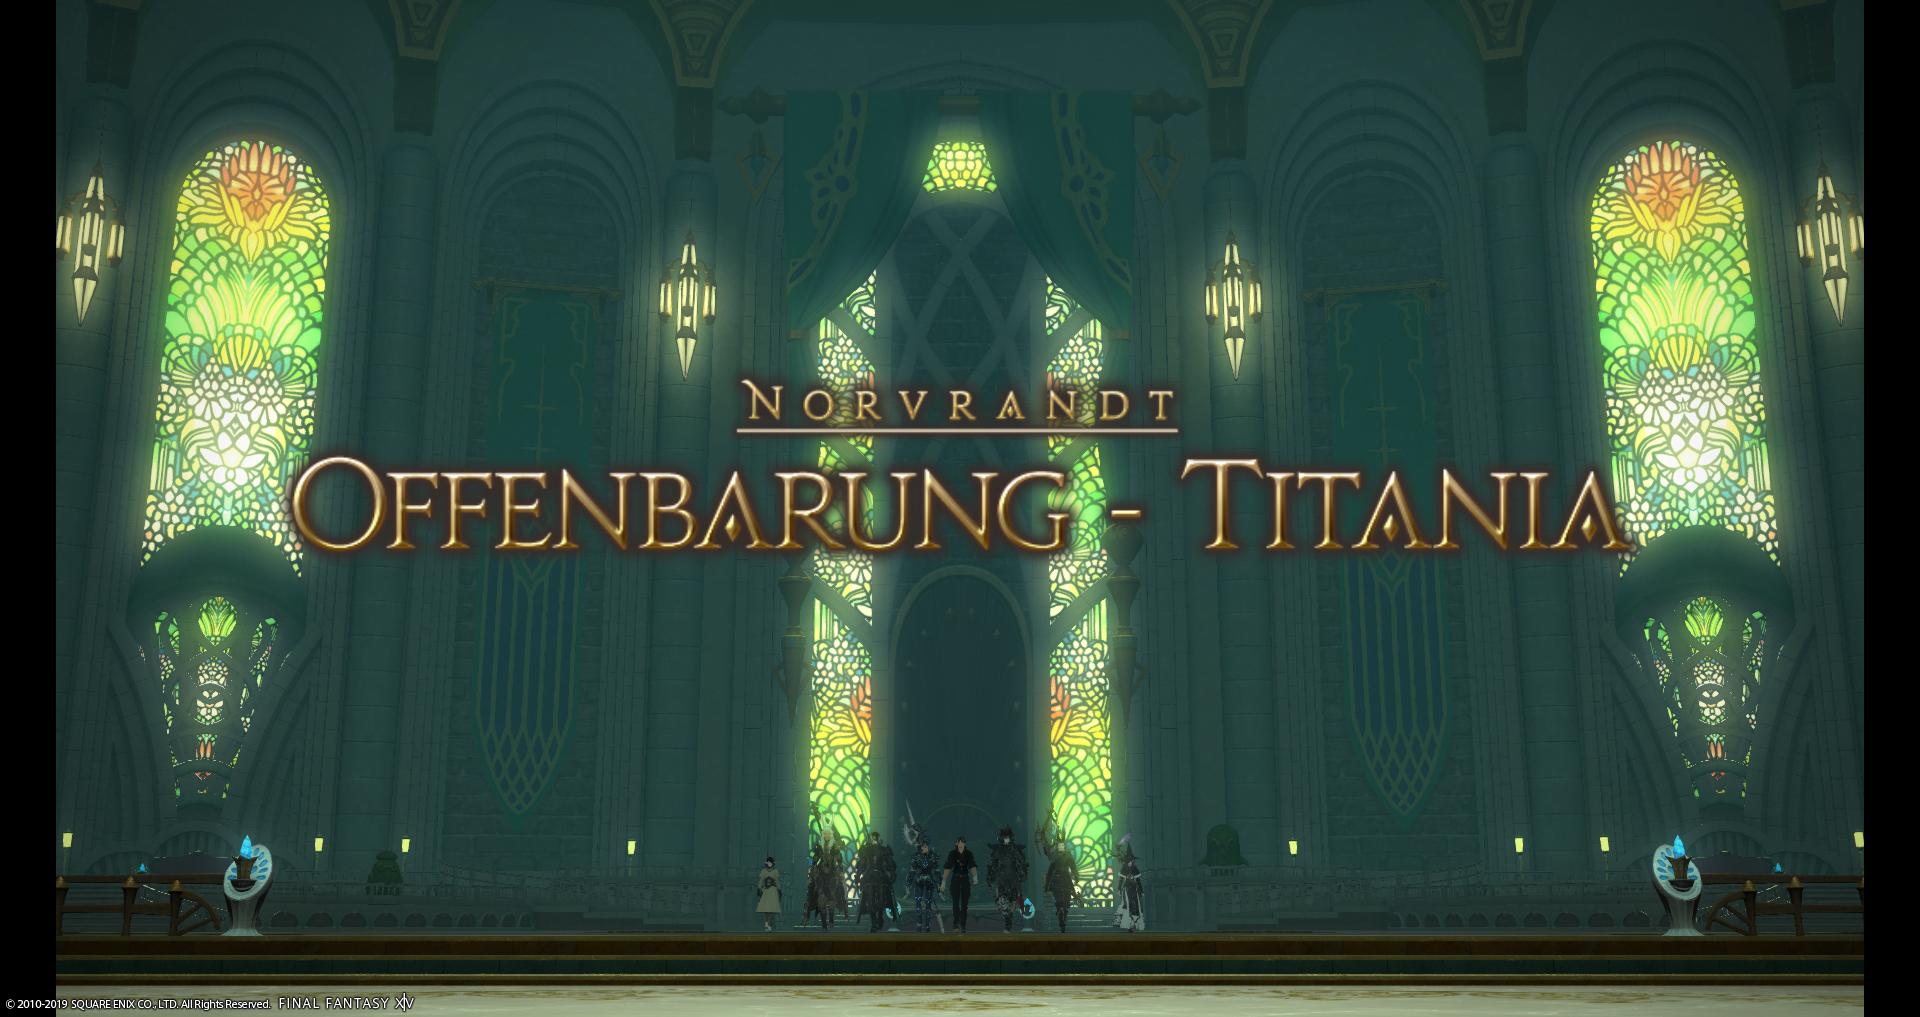 Final Fantasy XIV: Primae Guide - Offenbarung - Titania